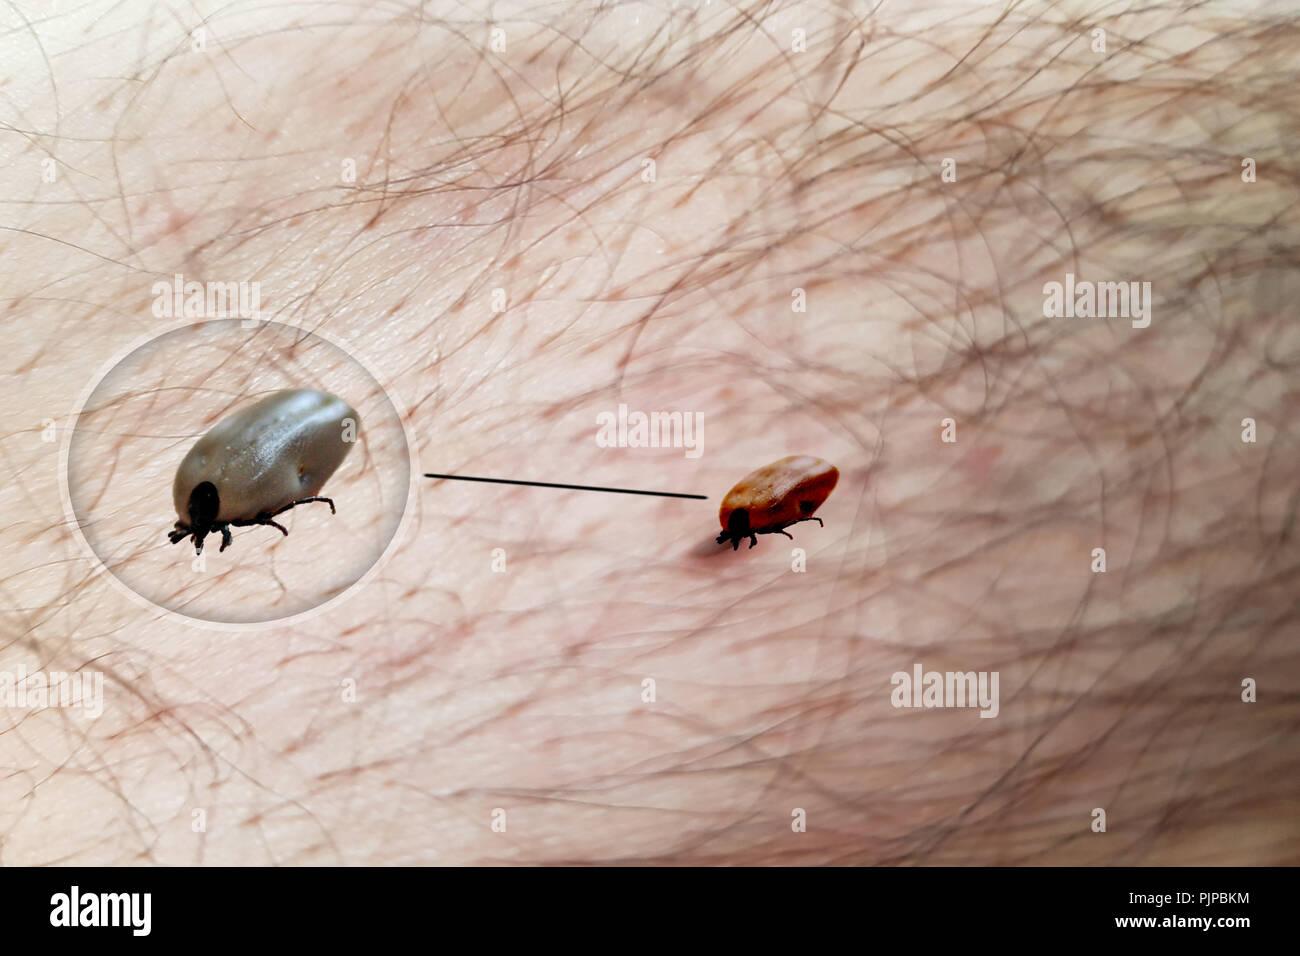 Tick crawls on the skin. Walking over the human body. The tick transmits encephalitis, Lyme disease, babesiosis and ehrlichiosis. - Stock Image